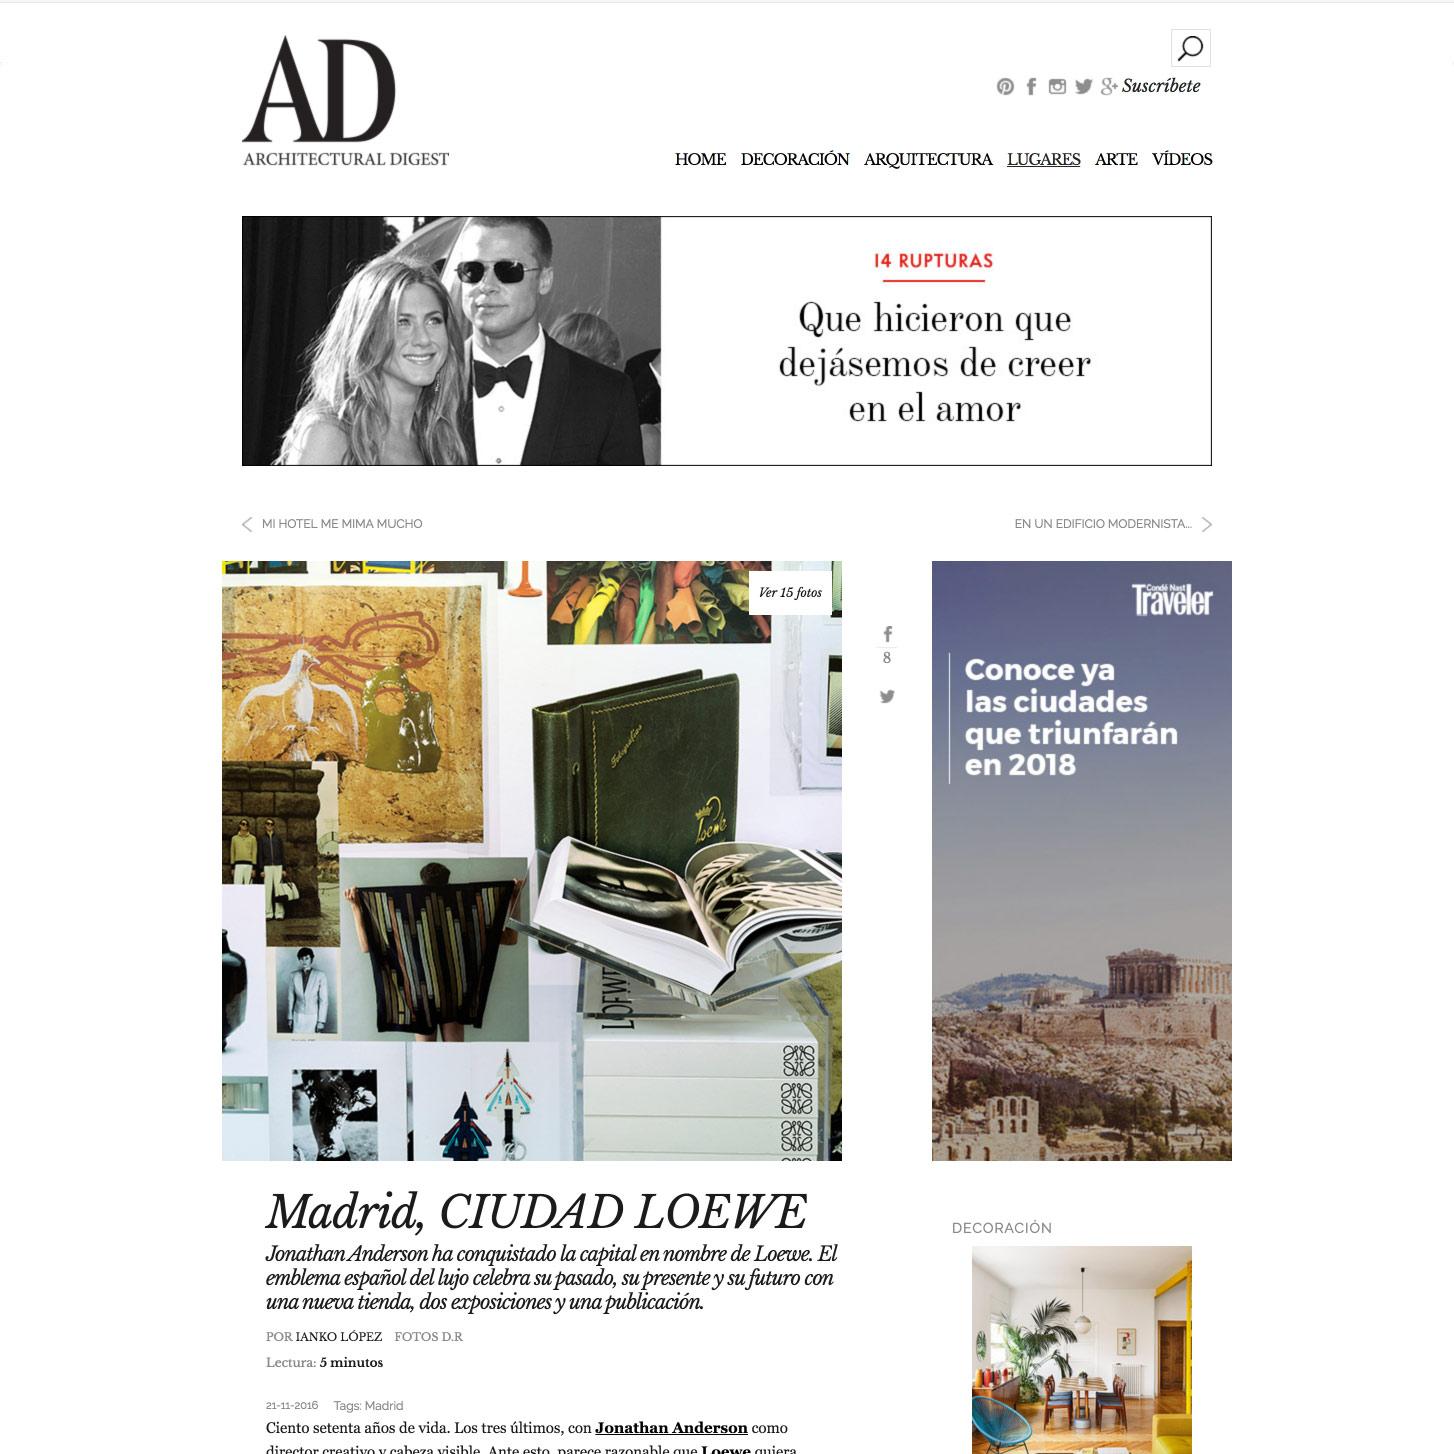 AD_LOEWEFLORES